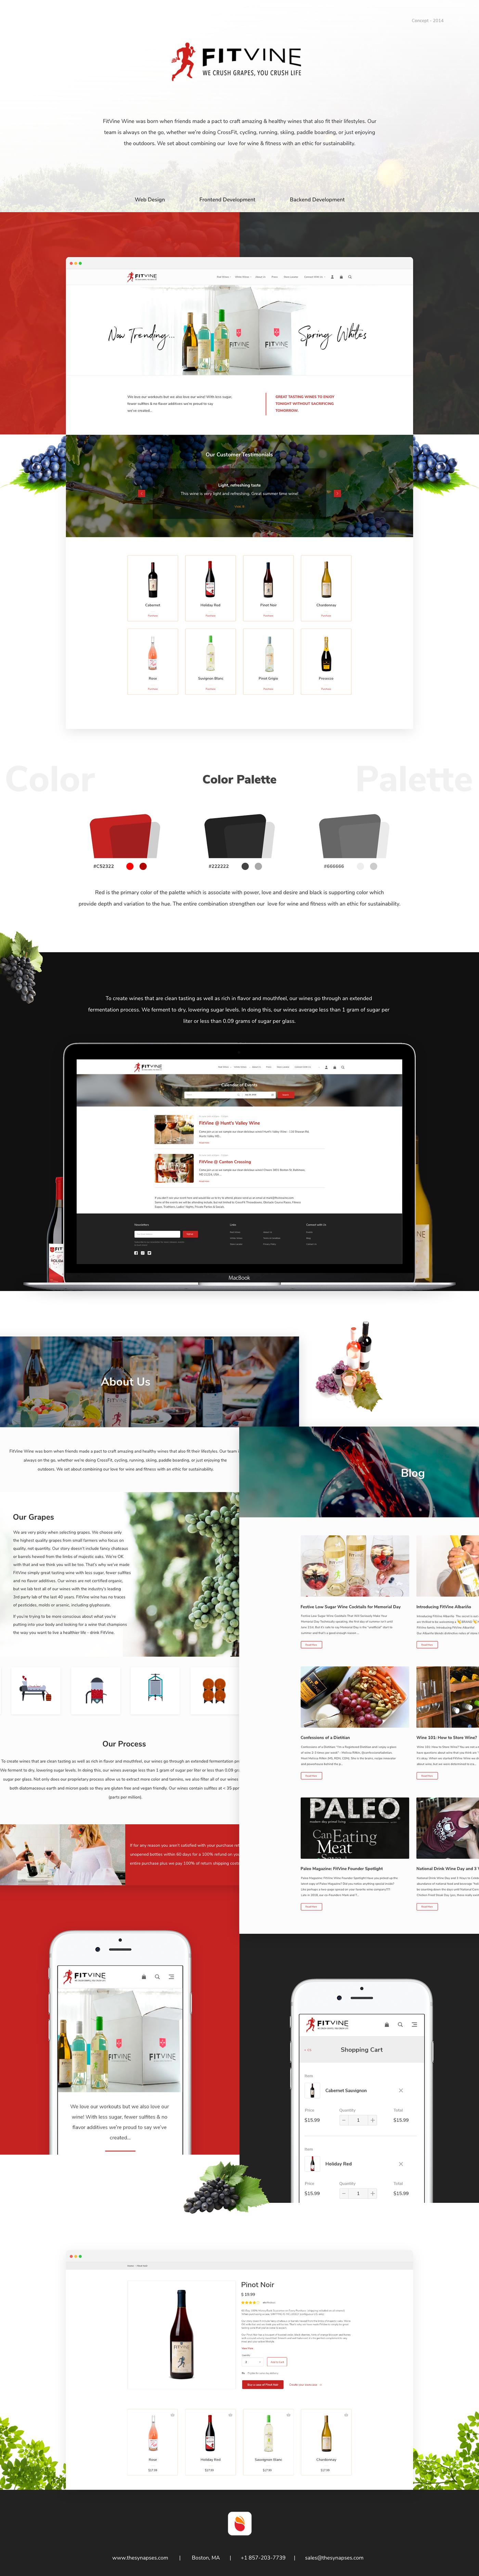 interactive portfolio UI Web Design  iOS App wine brand grapes red black theme Ecommerce